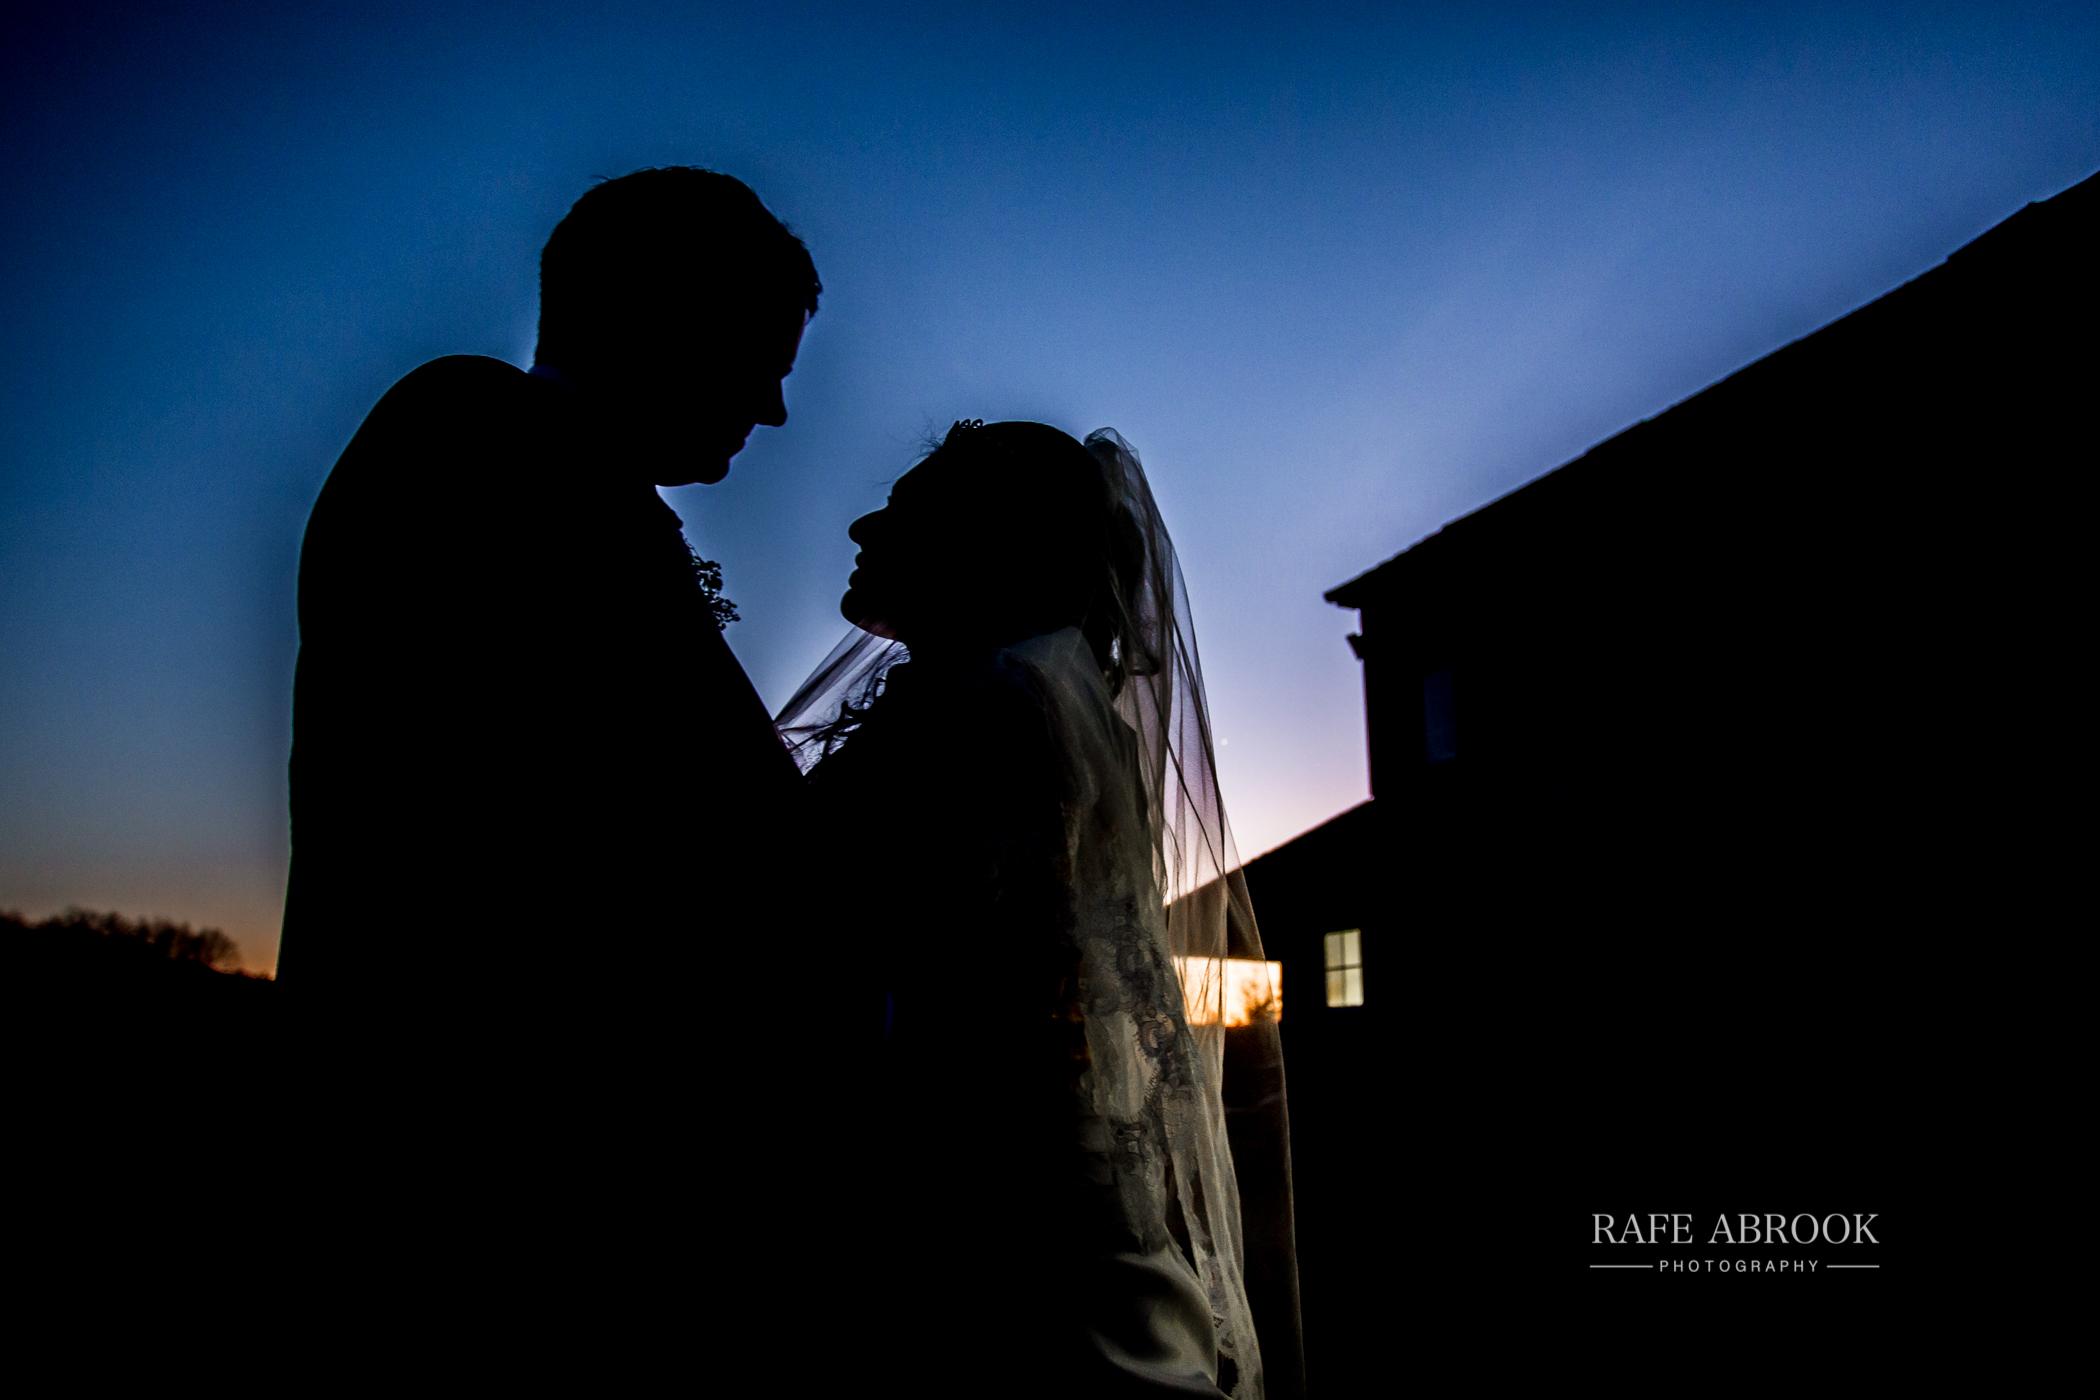 roma & pete wedding hampstead shenley hertfordshire -612.jpg